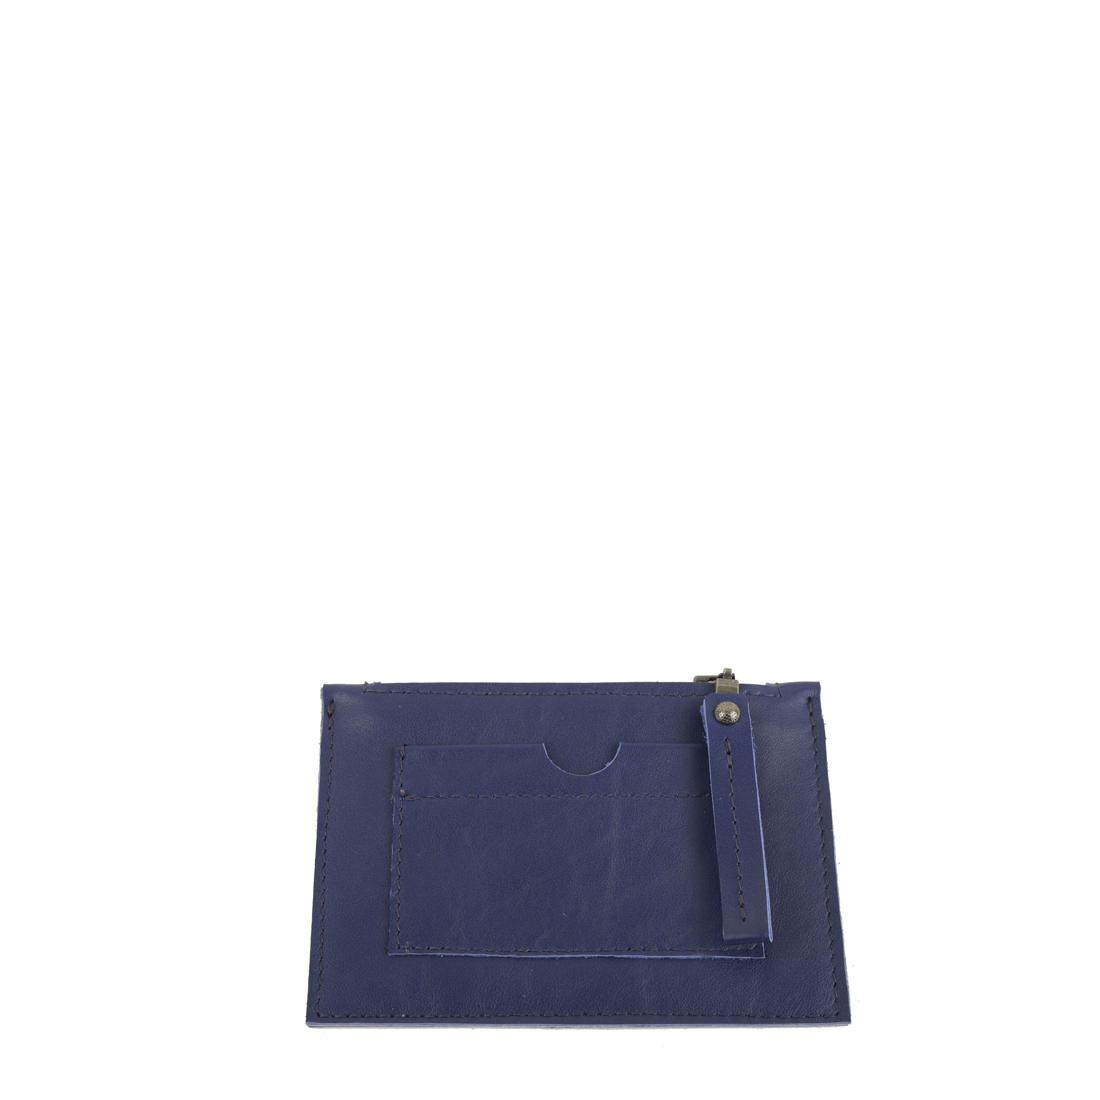 Purple Blue Small Leather Credit Card Purse